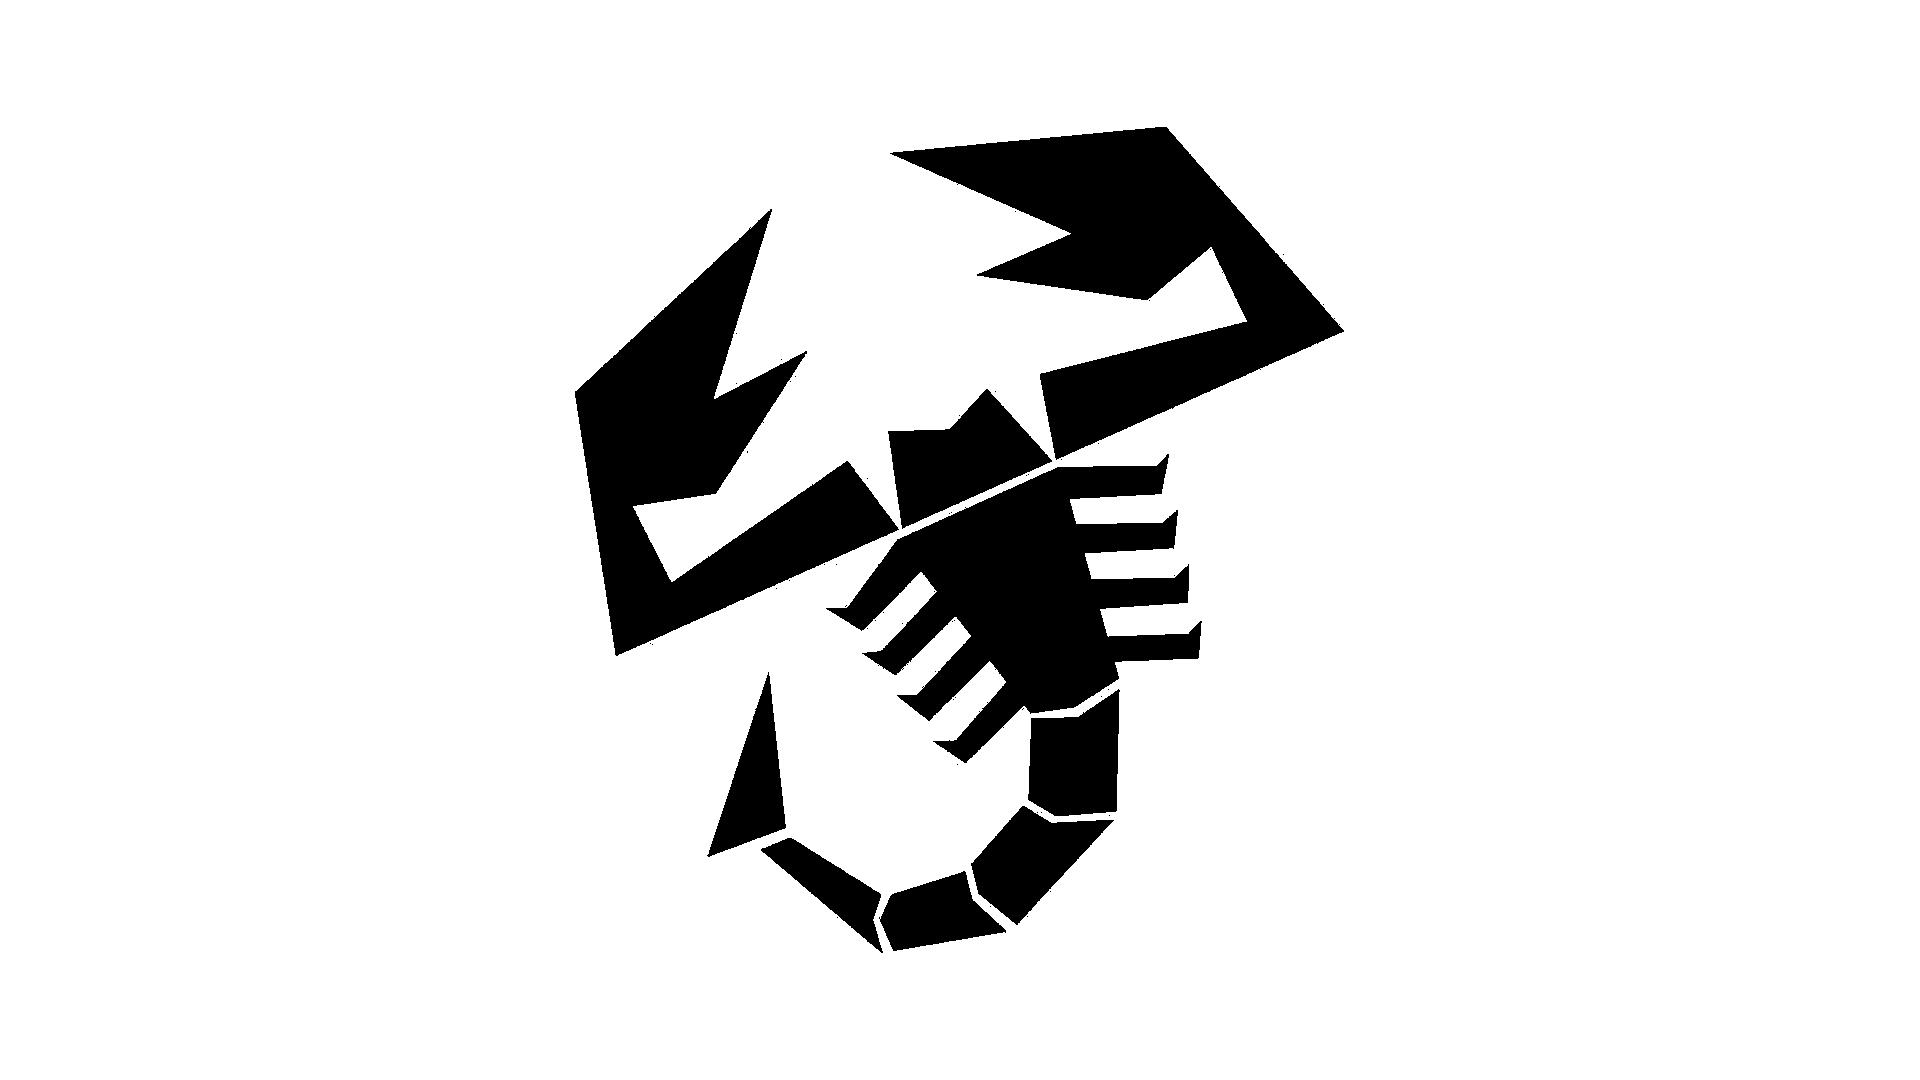 Scorpion HD PNG - 92787